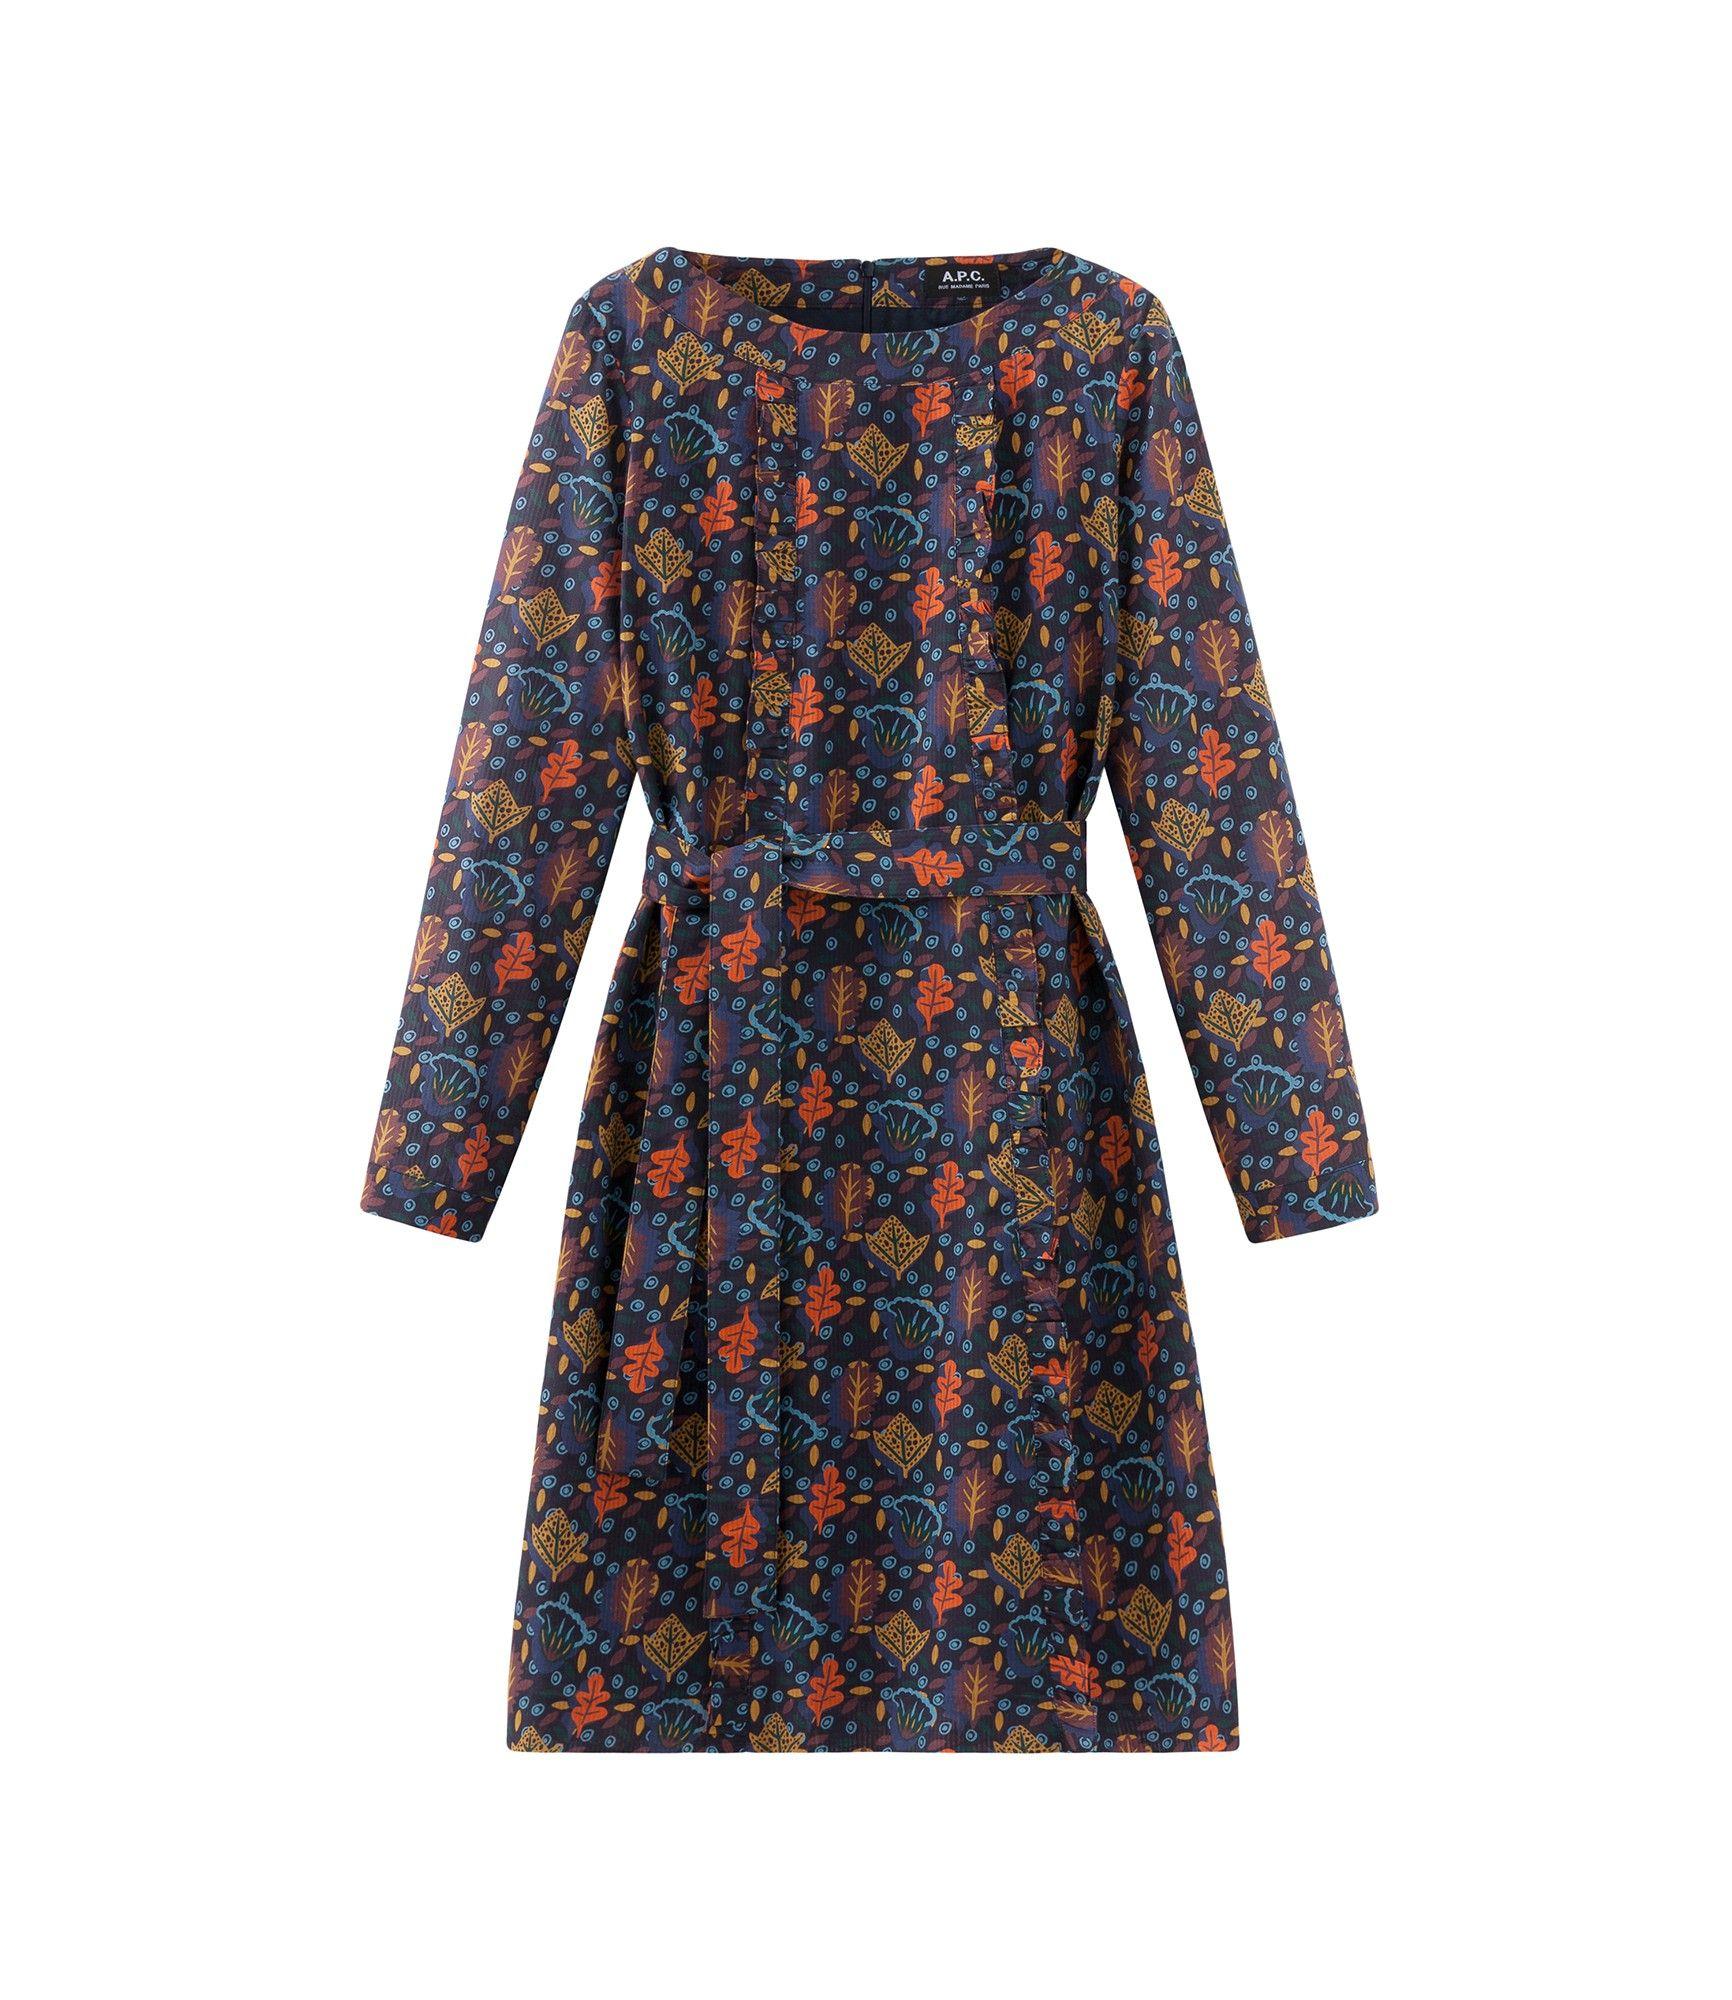 Kleid Maja - Mehrfarbig - Kleid - Prêt-à-porter A.P.C ...